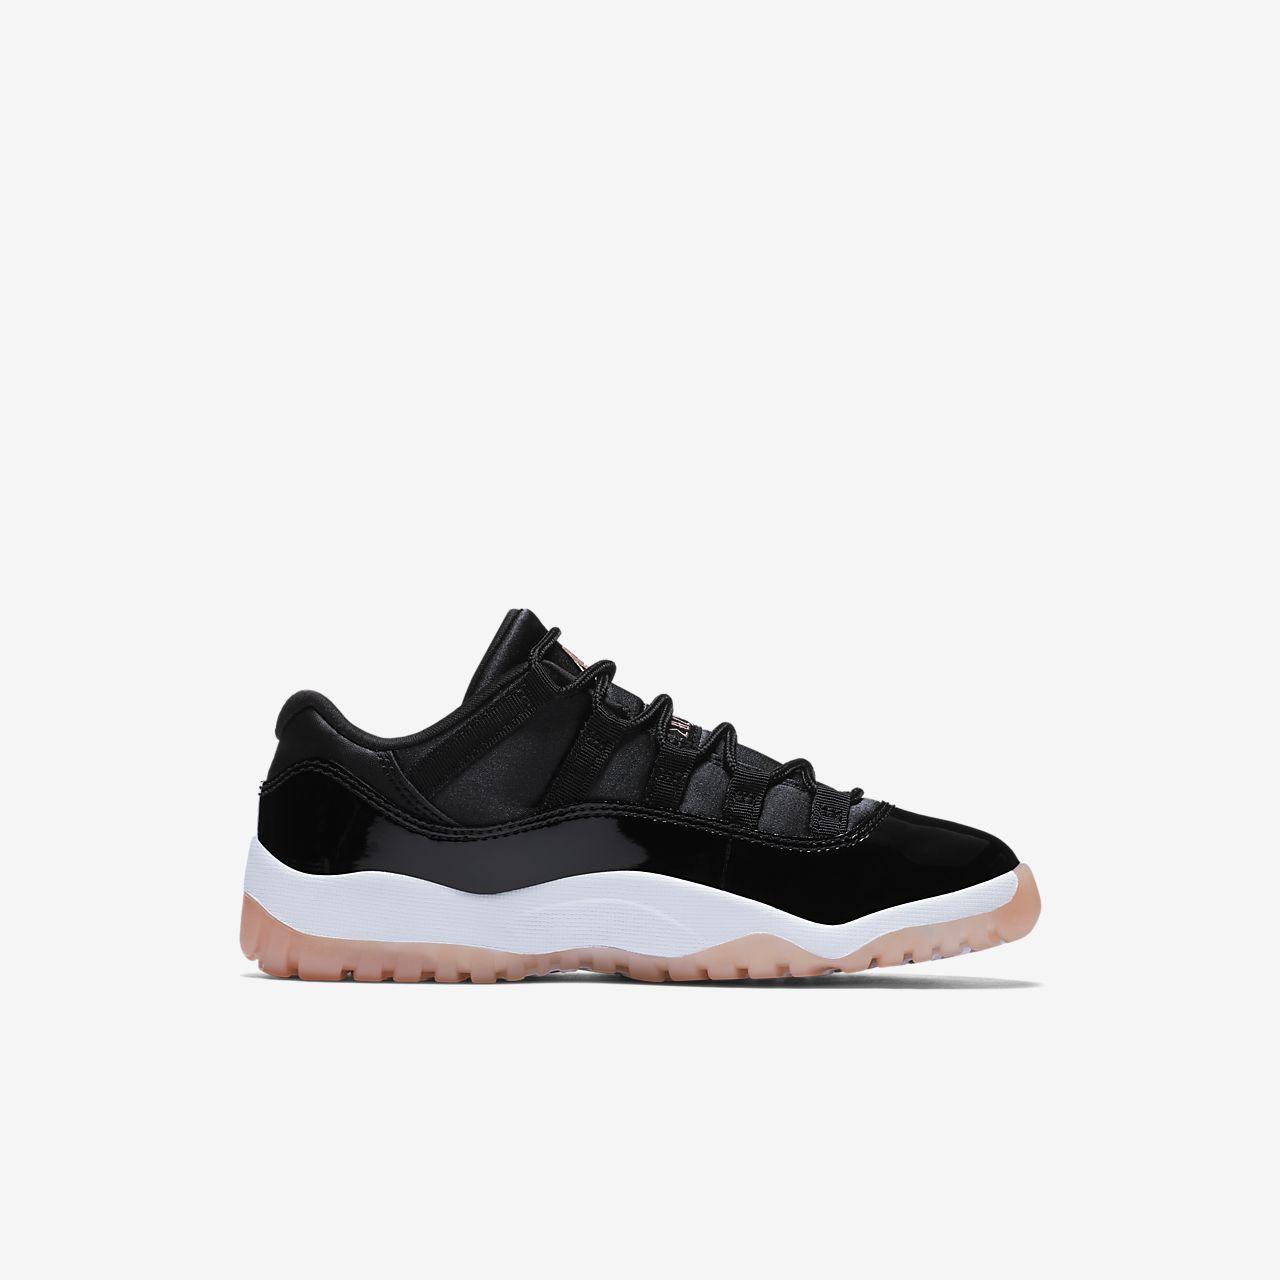 ... Air Jordan 11 Retro Low Little Kids' Shoe